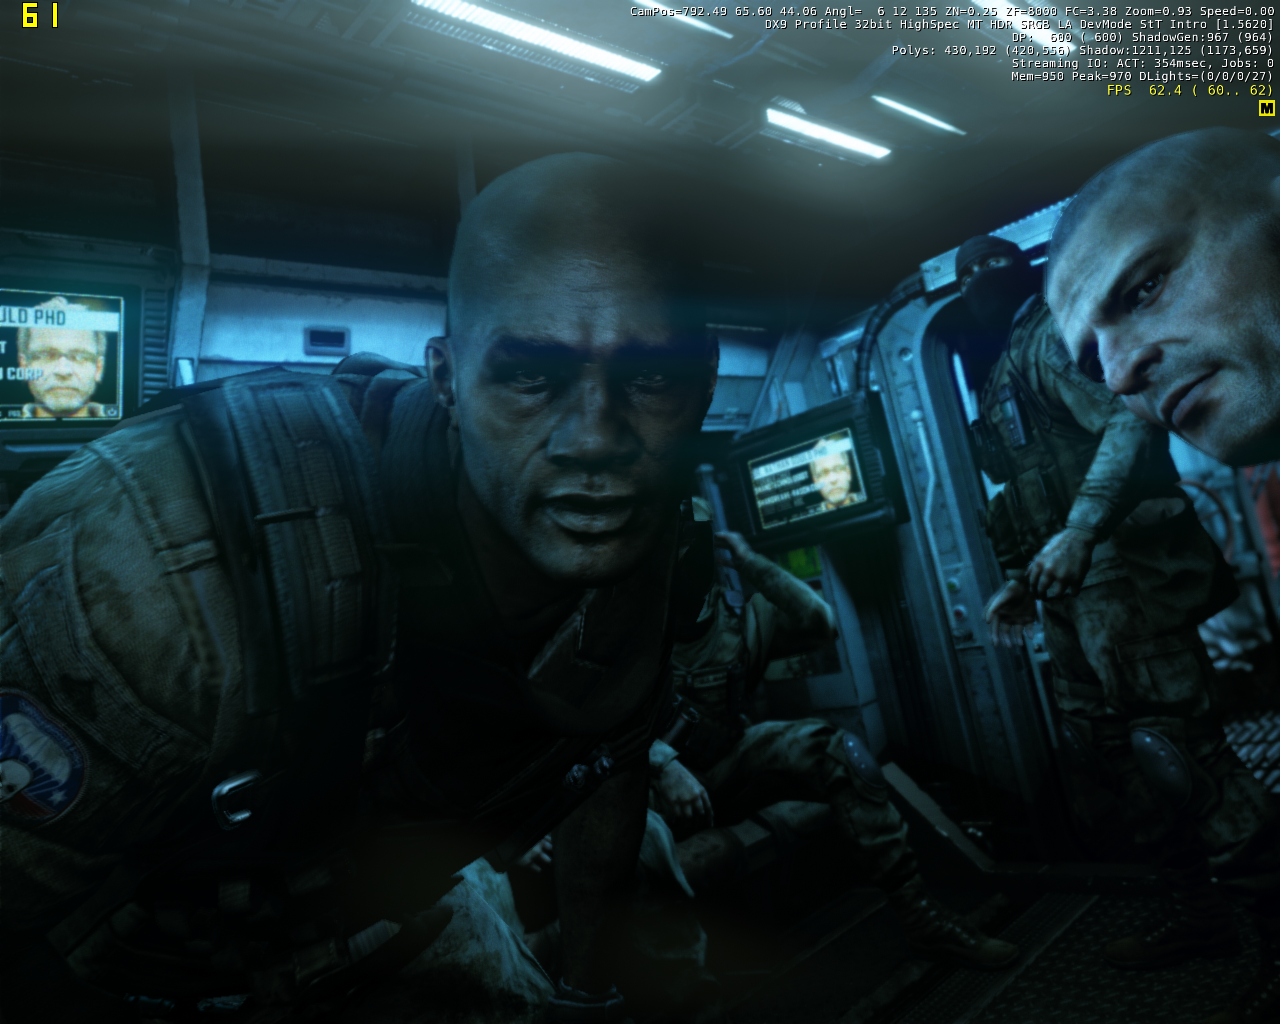 Crysis2 leak